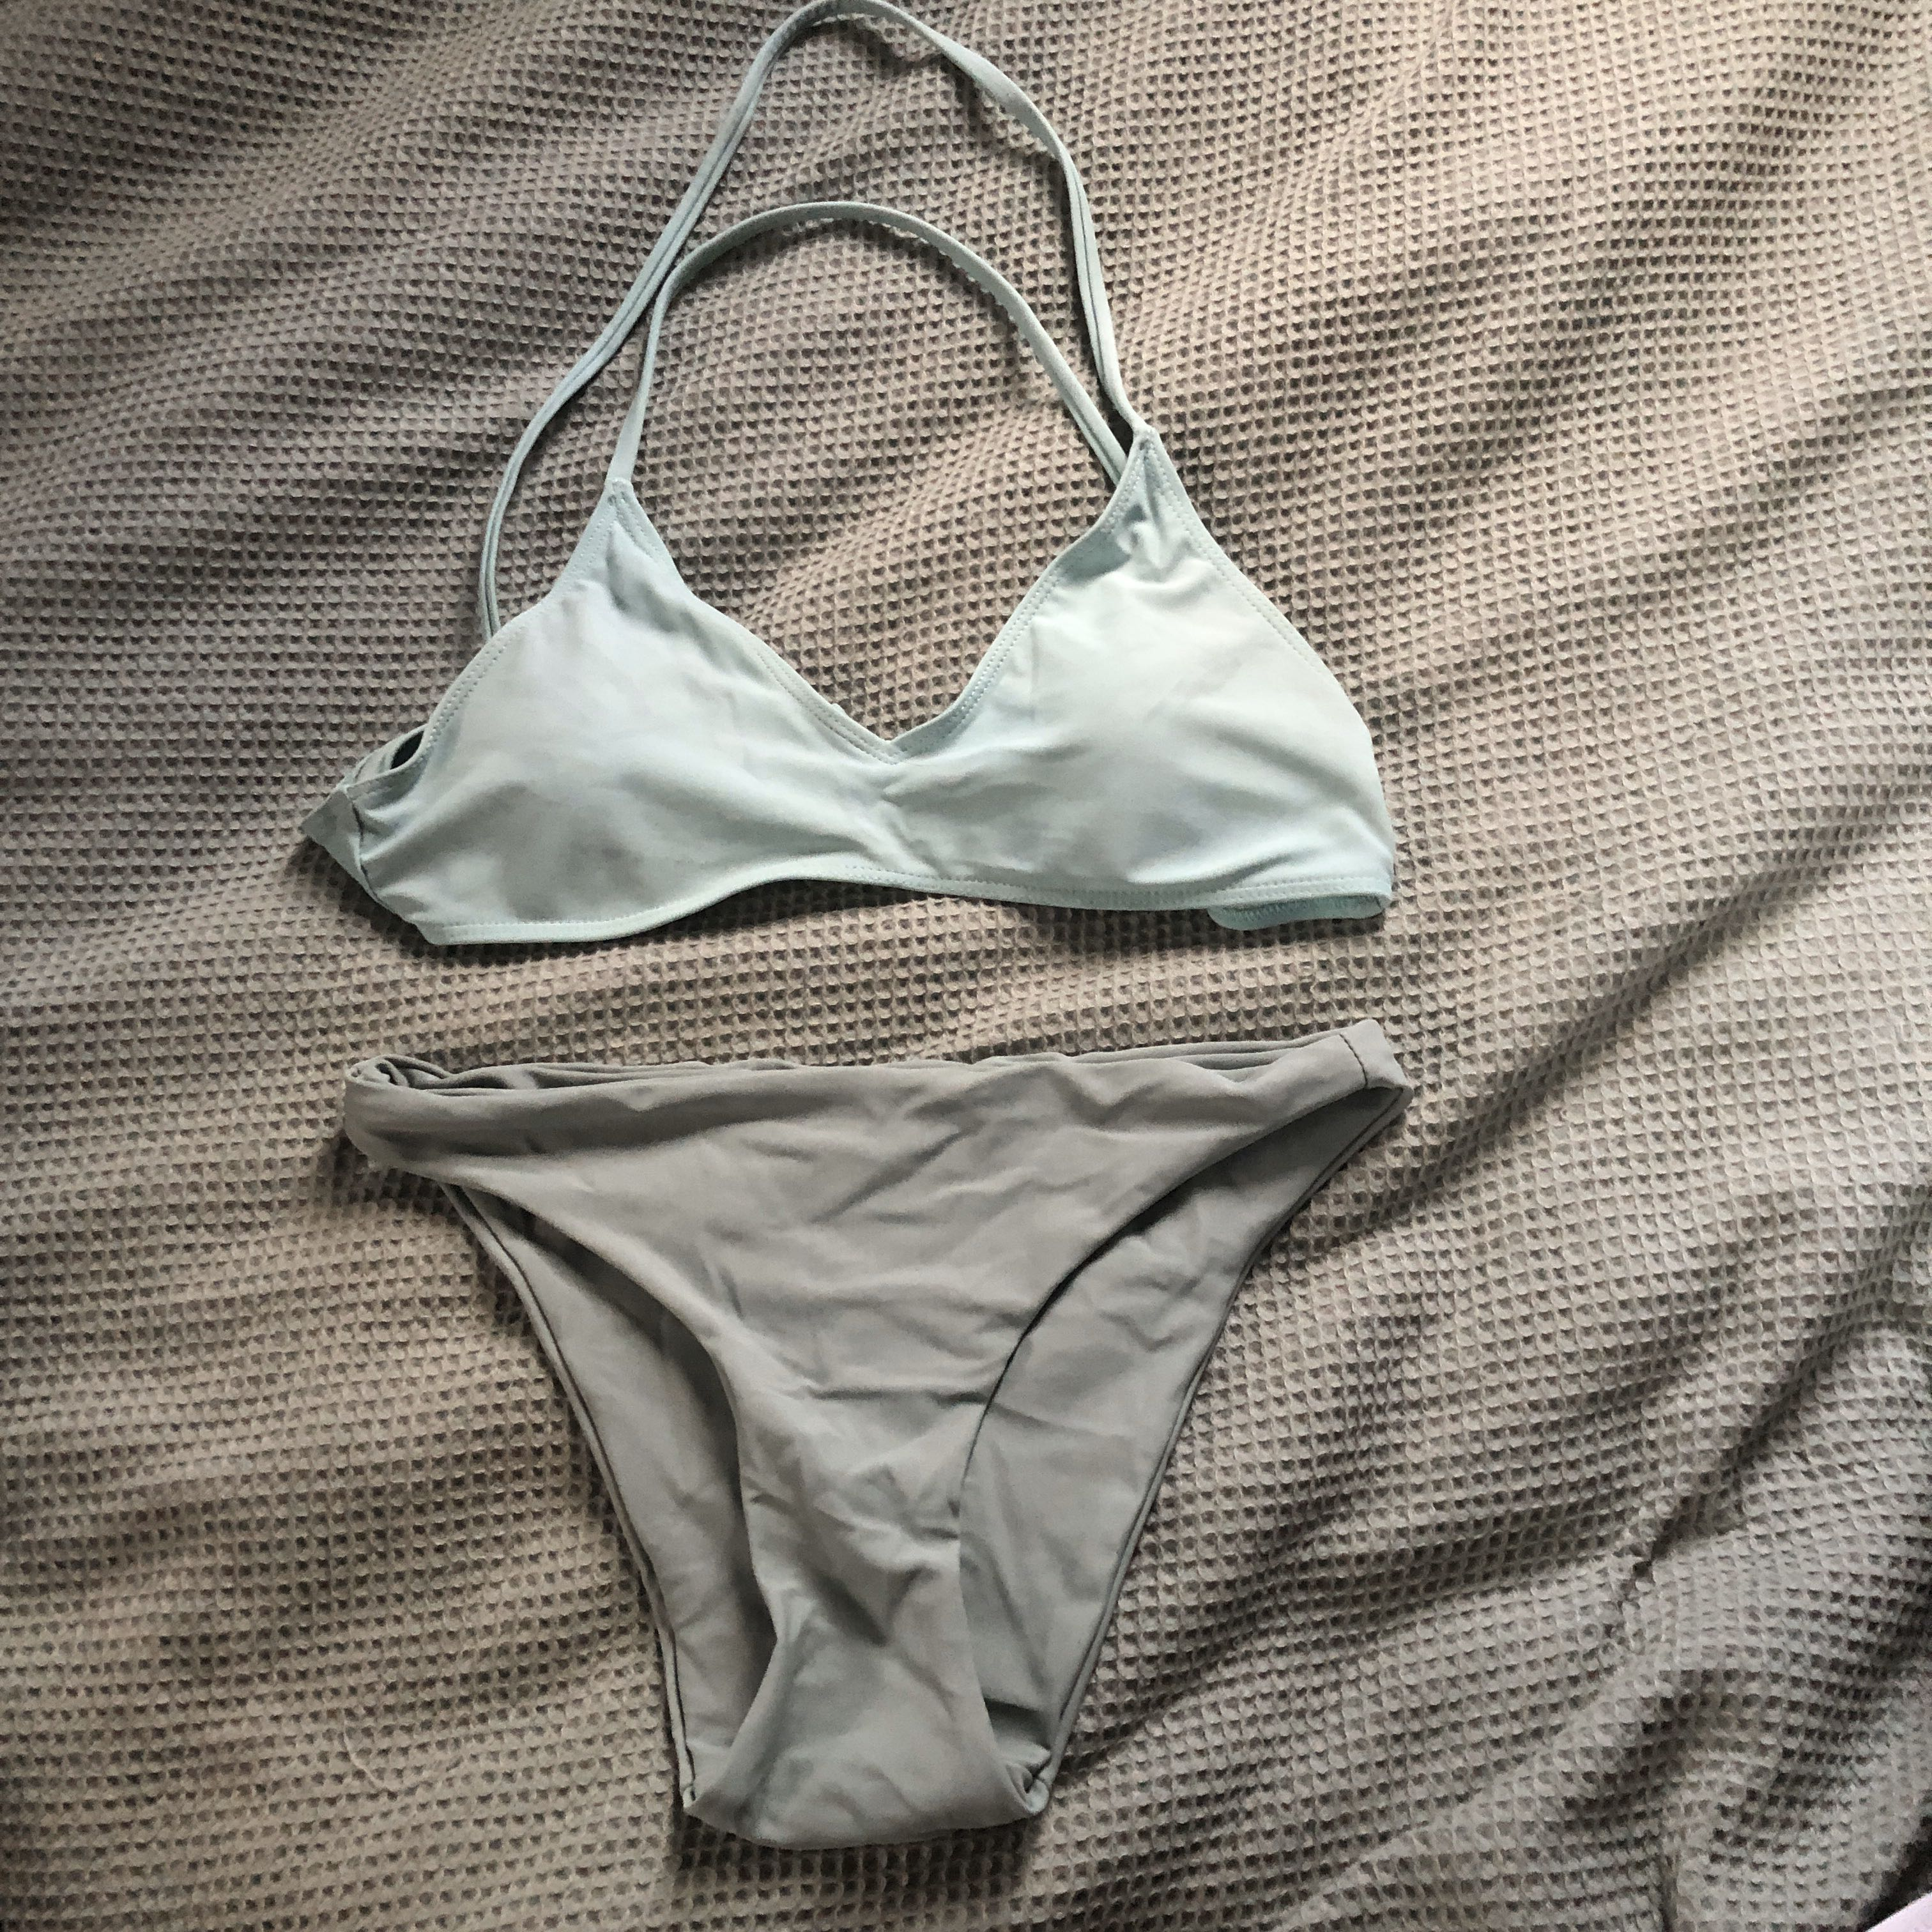 Turquoise bikini size 8